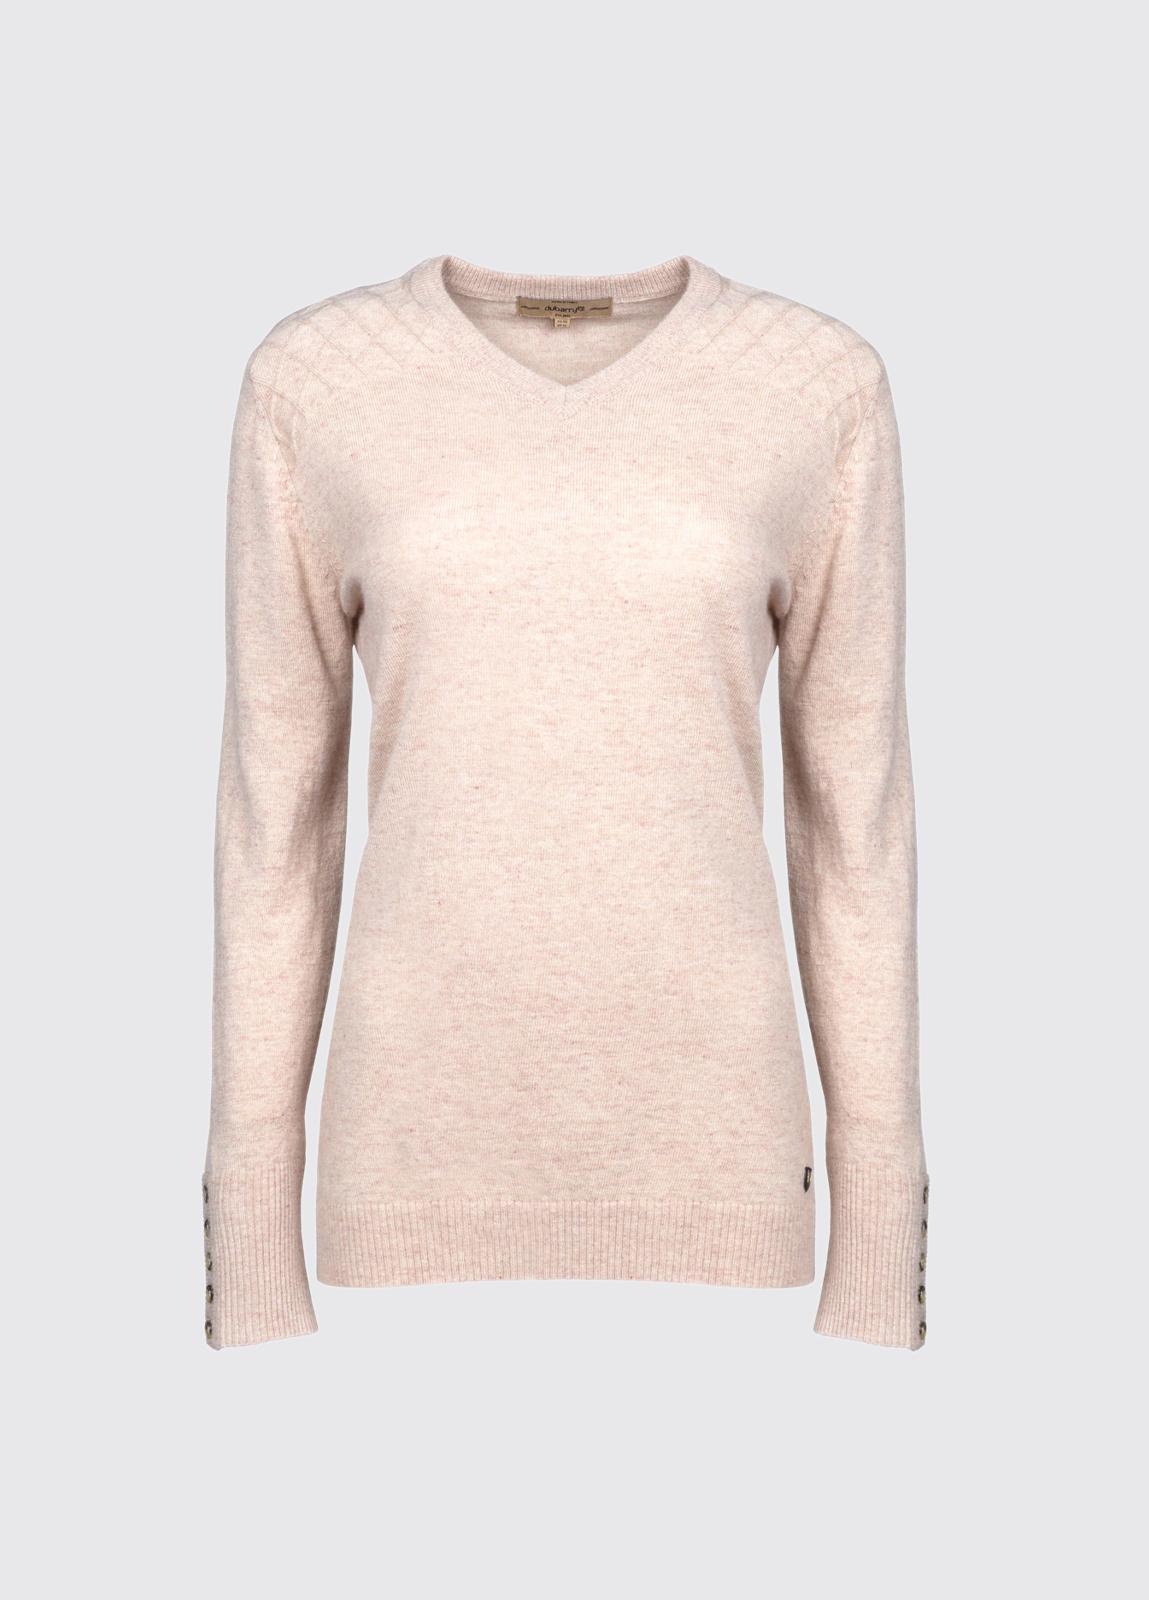 Blackwater Sweater - Oatmeal